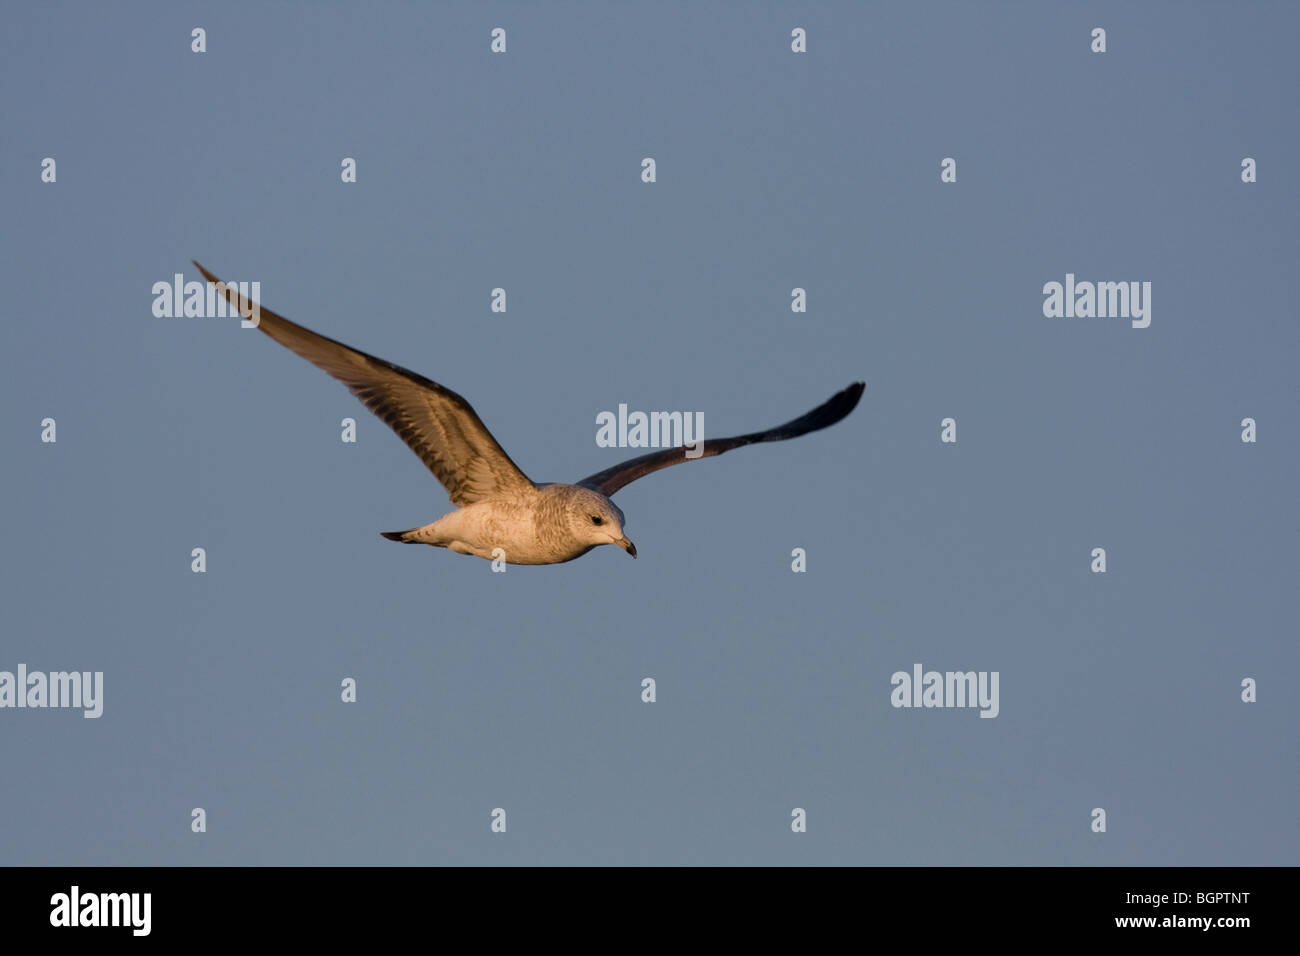 Common Gull Larus canus immature flying against blue sky, Steart, Somerset. - Stock Image